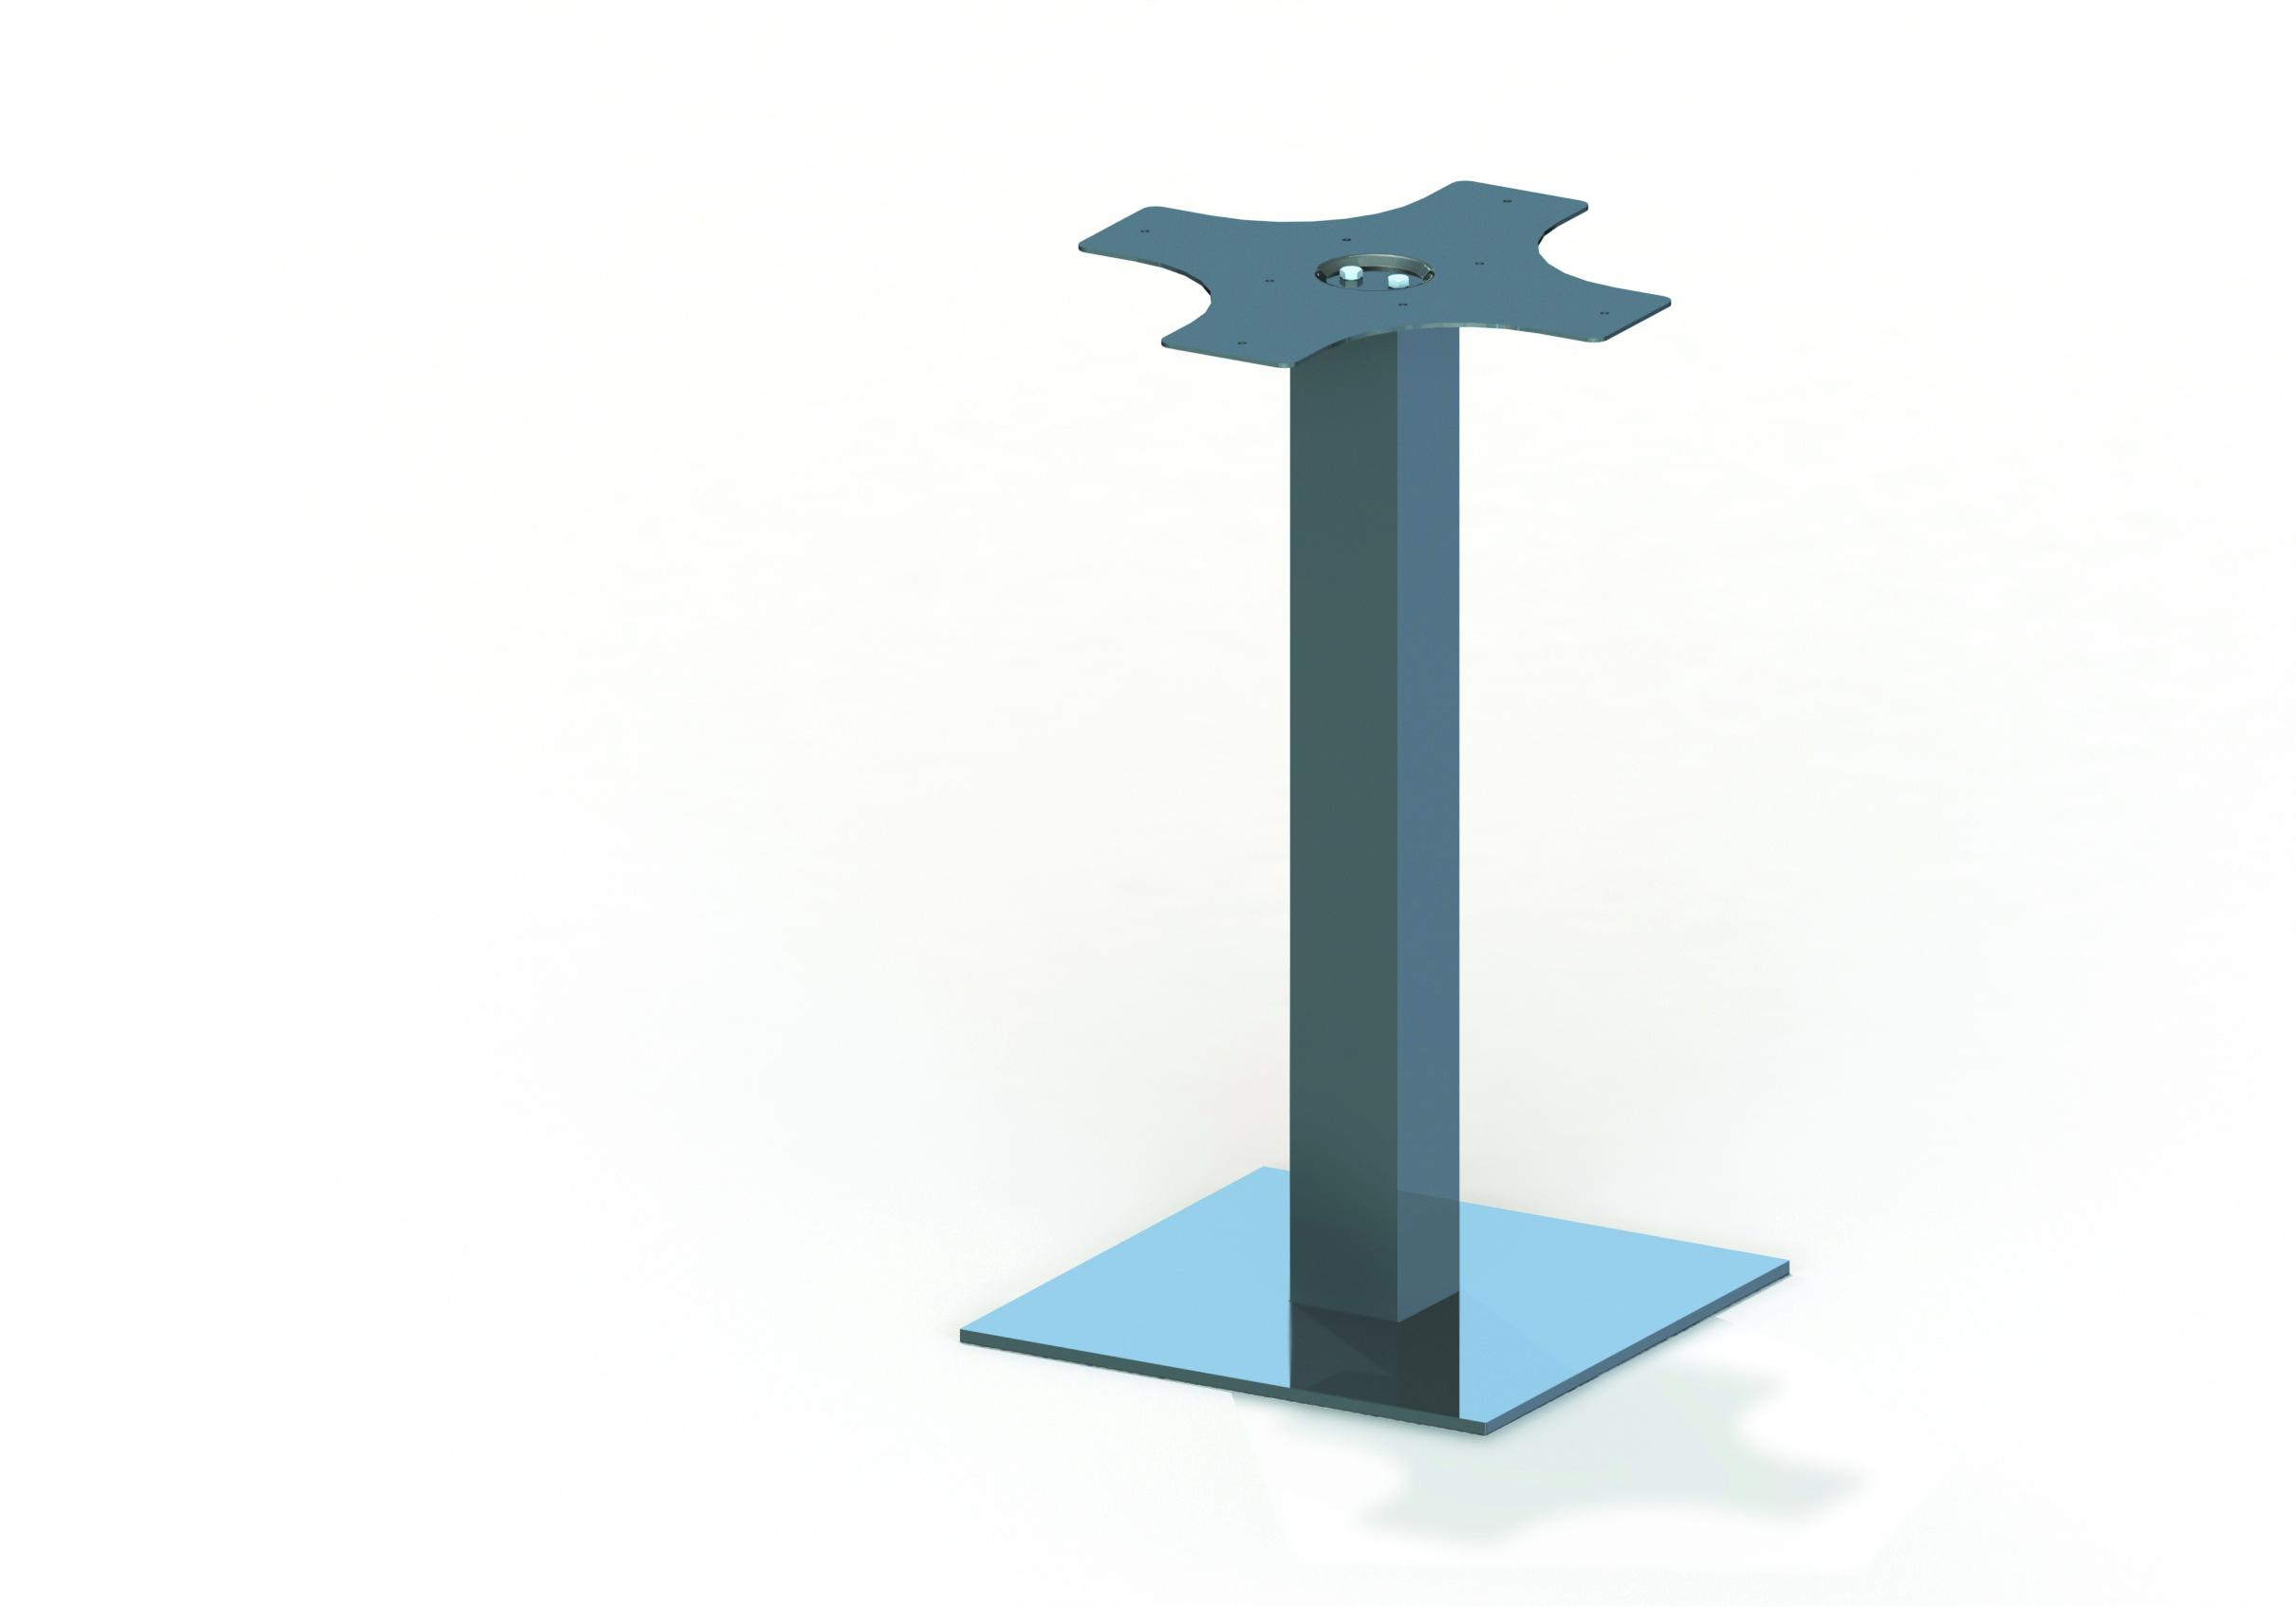 Pata para mesas hera 100 - Patas plegables para mesas ...